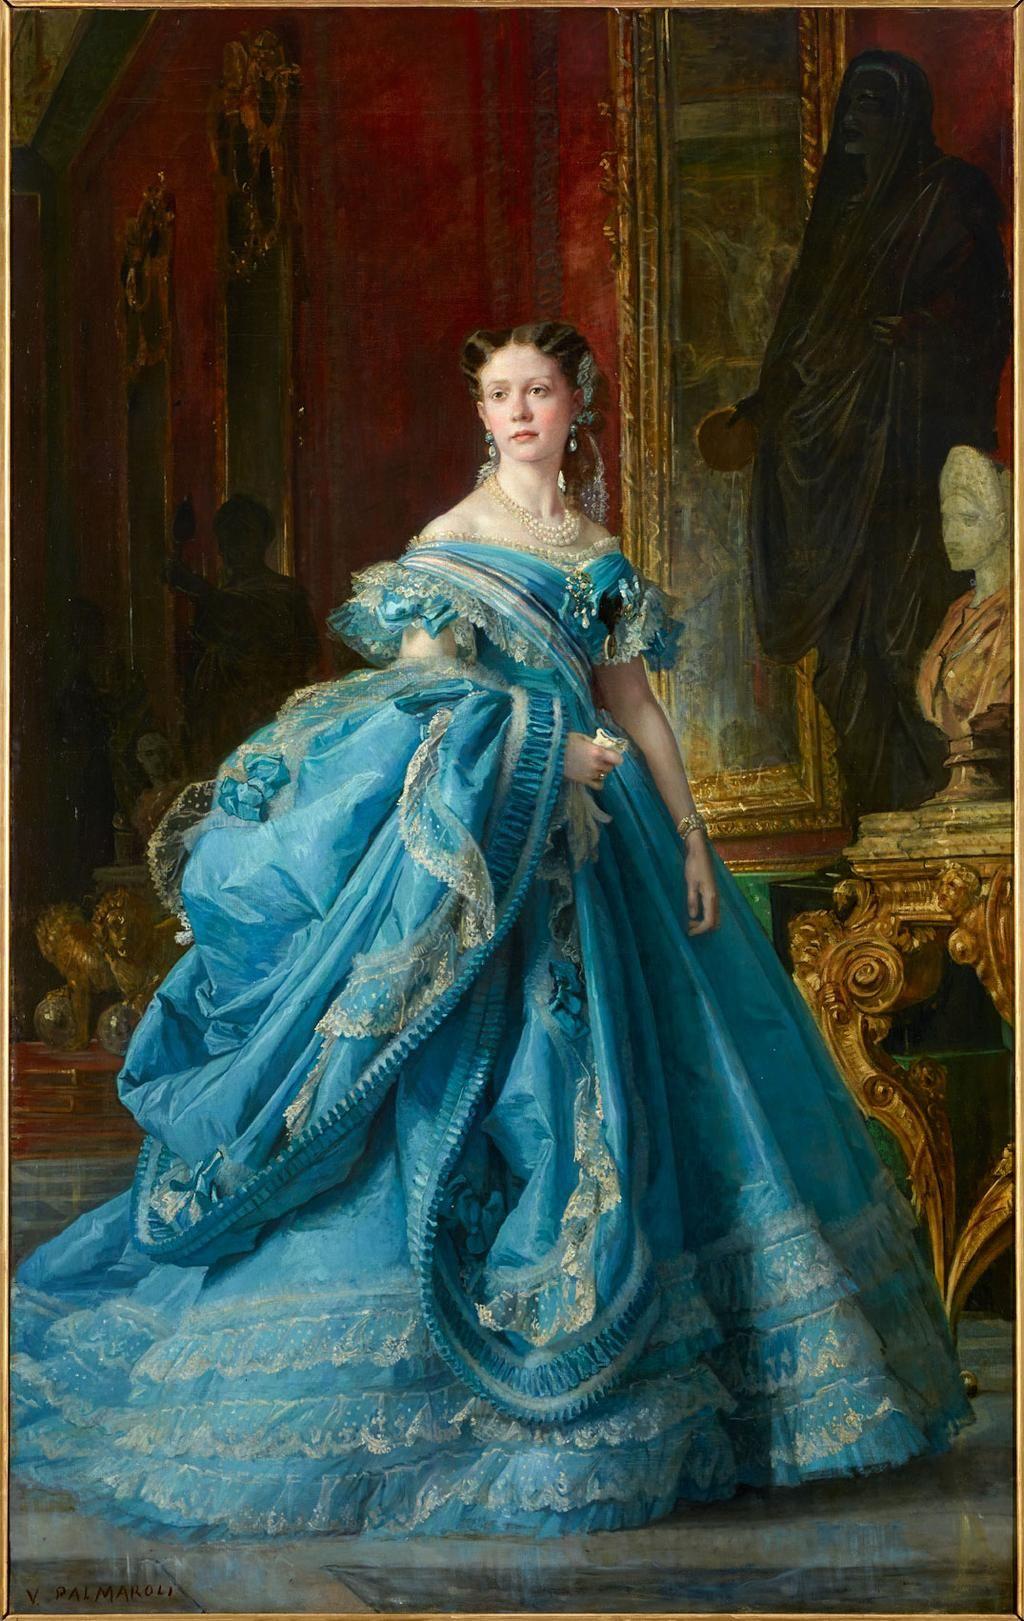 Vicente Palmaroli González (18341896) — Infanta María